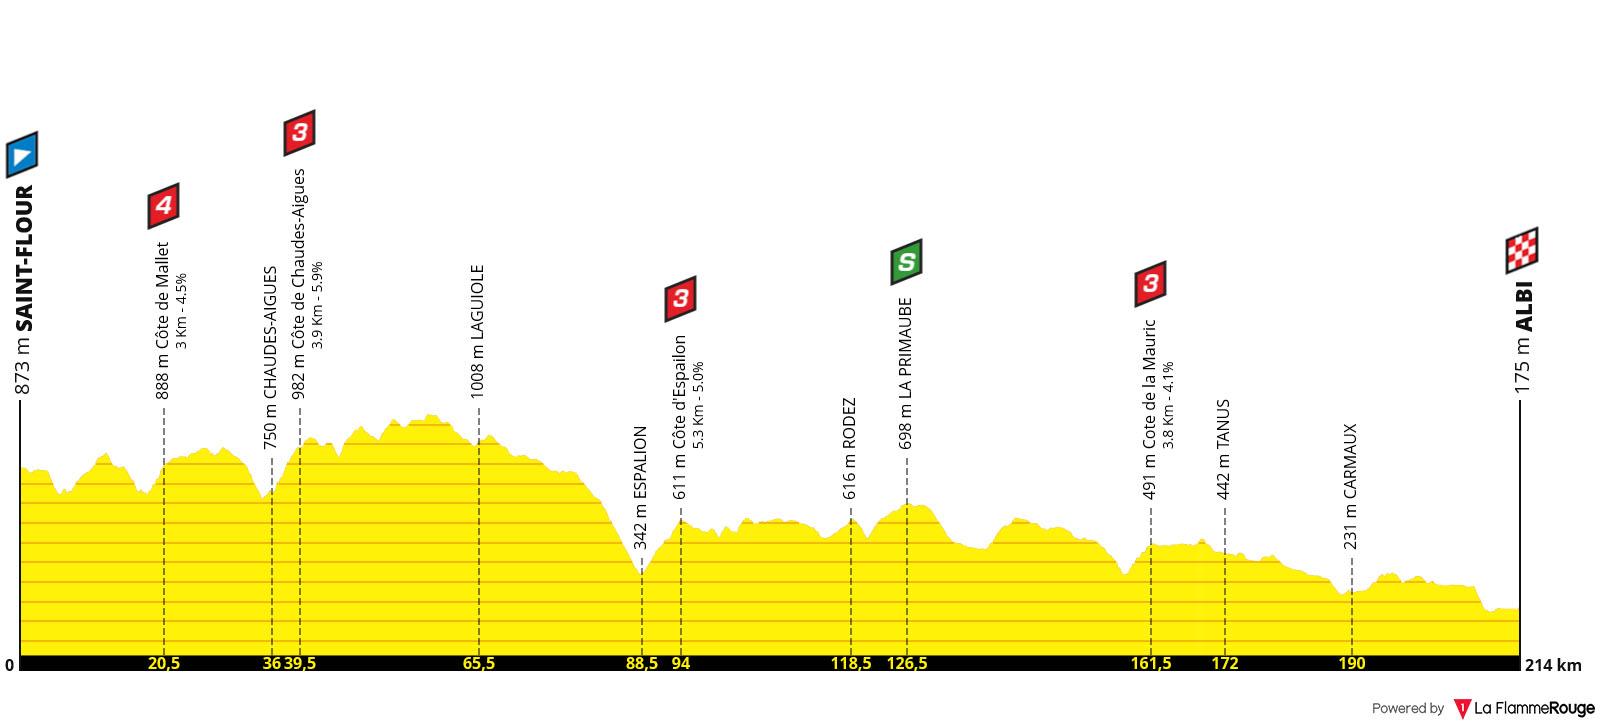 Perfil Etapa 10 - Tour de Francia 2019